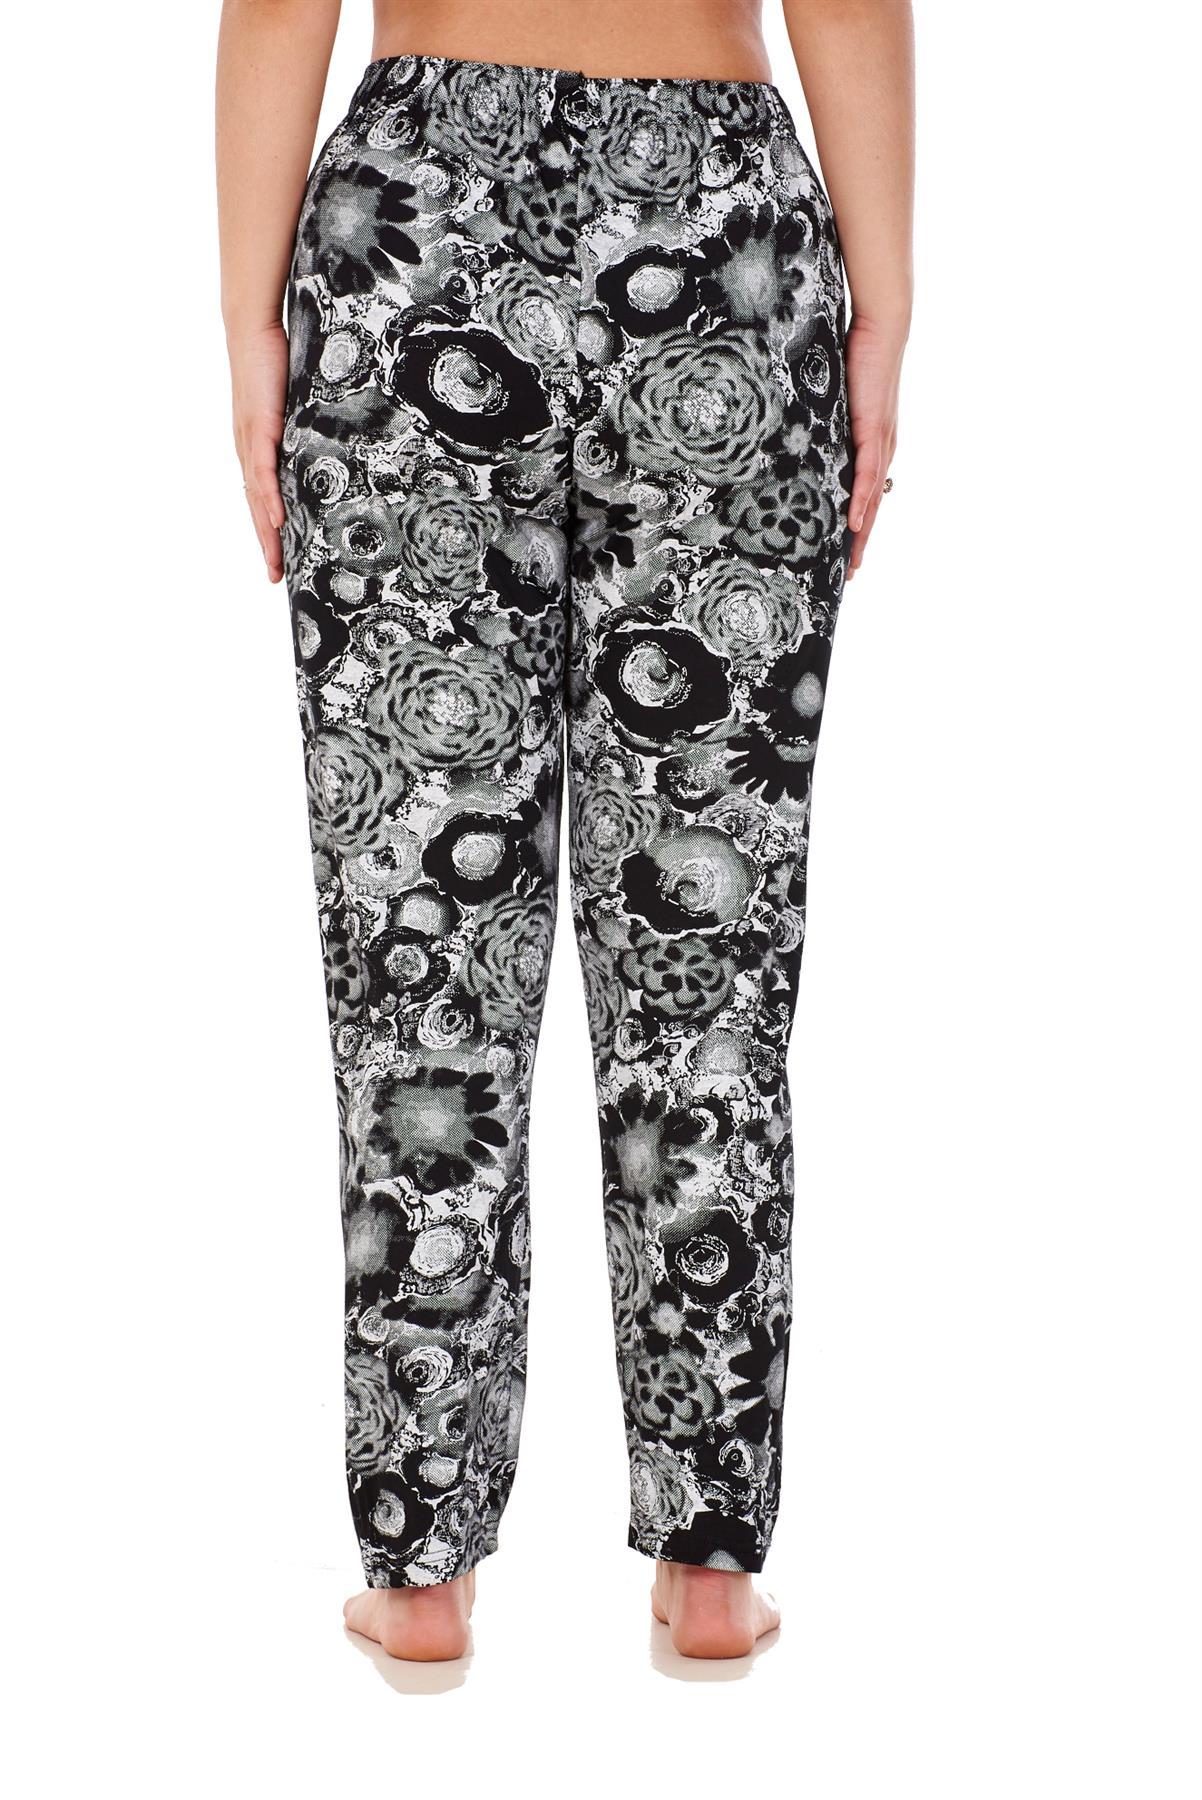 Ladies-Women-Trouser-Elasticated-Printed-Tapered-Harem-High-waist-Regular-Pants thumbnail 4